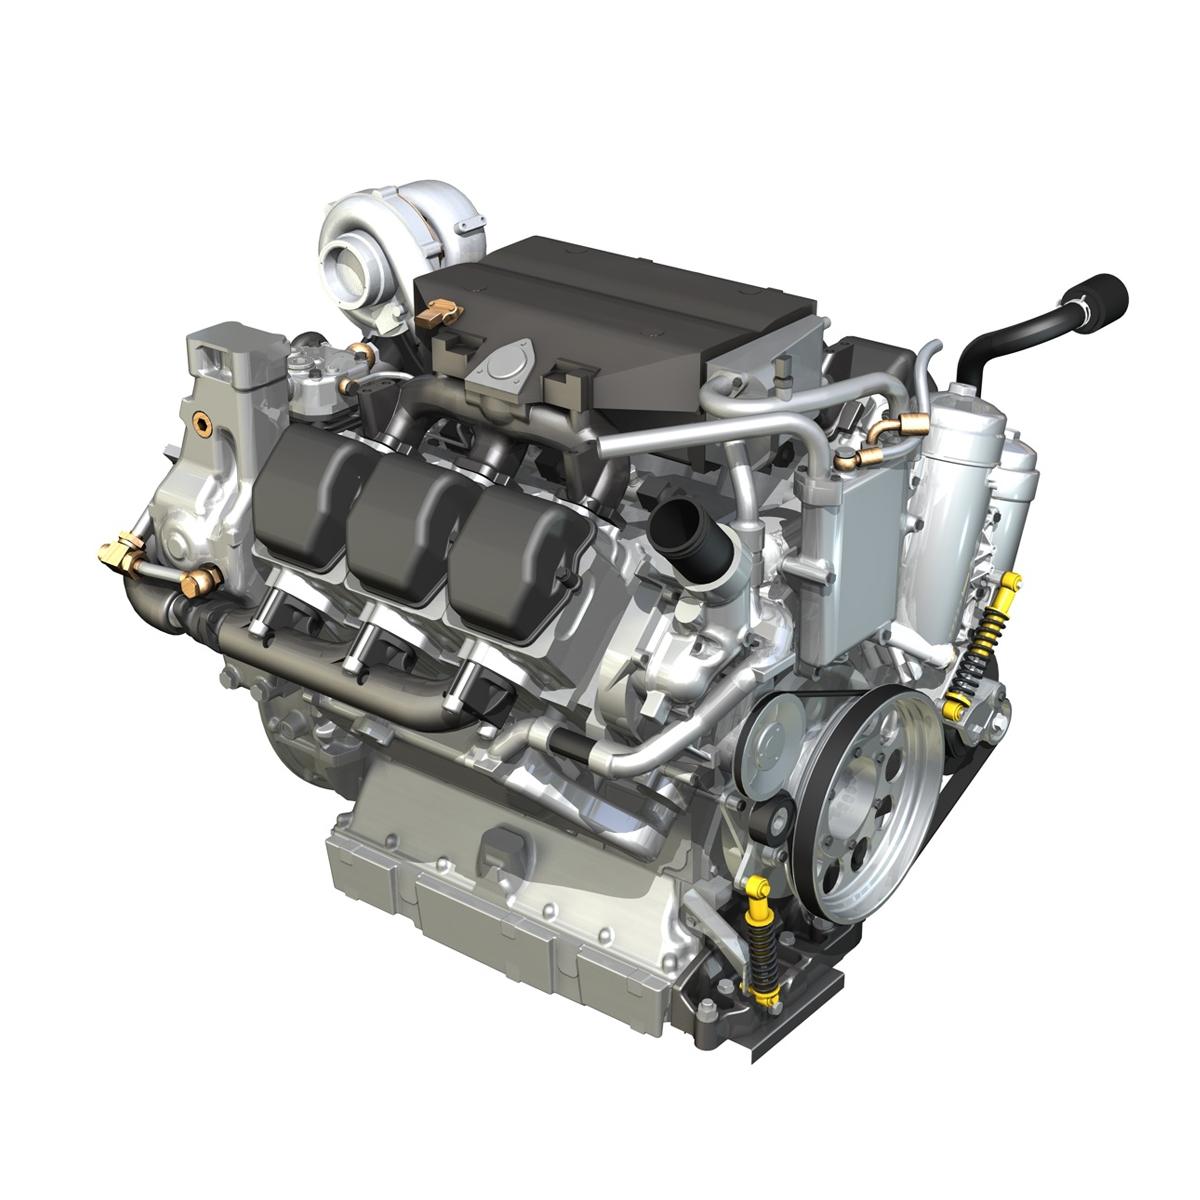 diesel turbo engine with inner workings 3d model. Black Bedroom Furniture Sets. Home Design Ideas